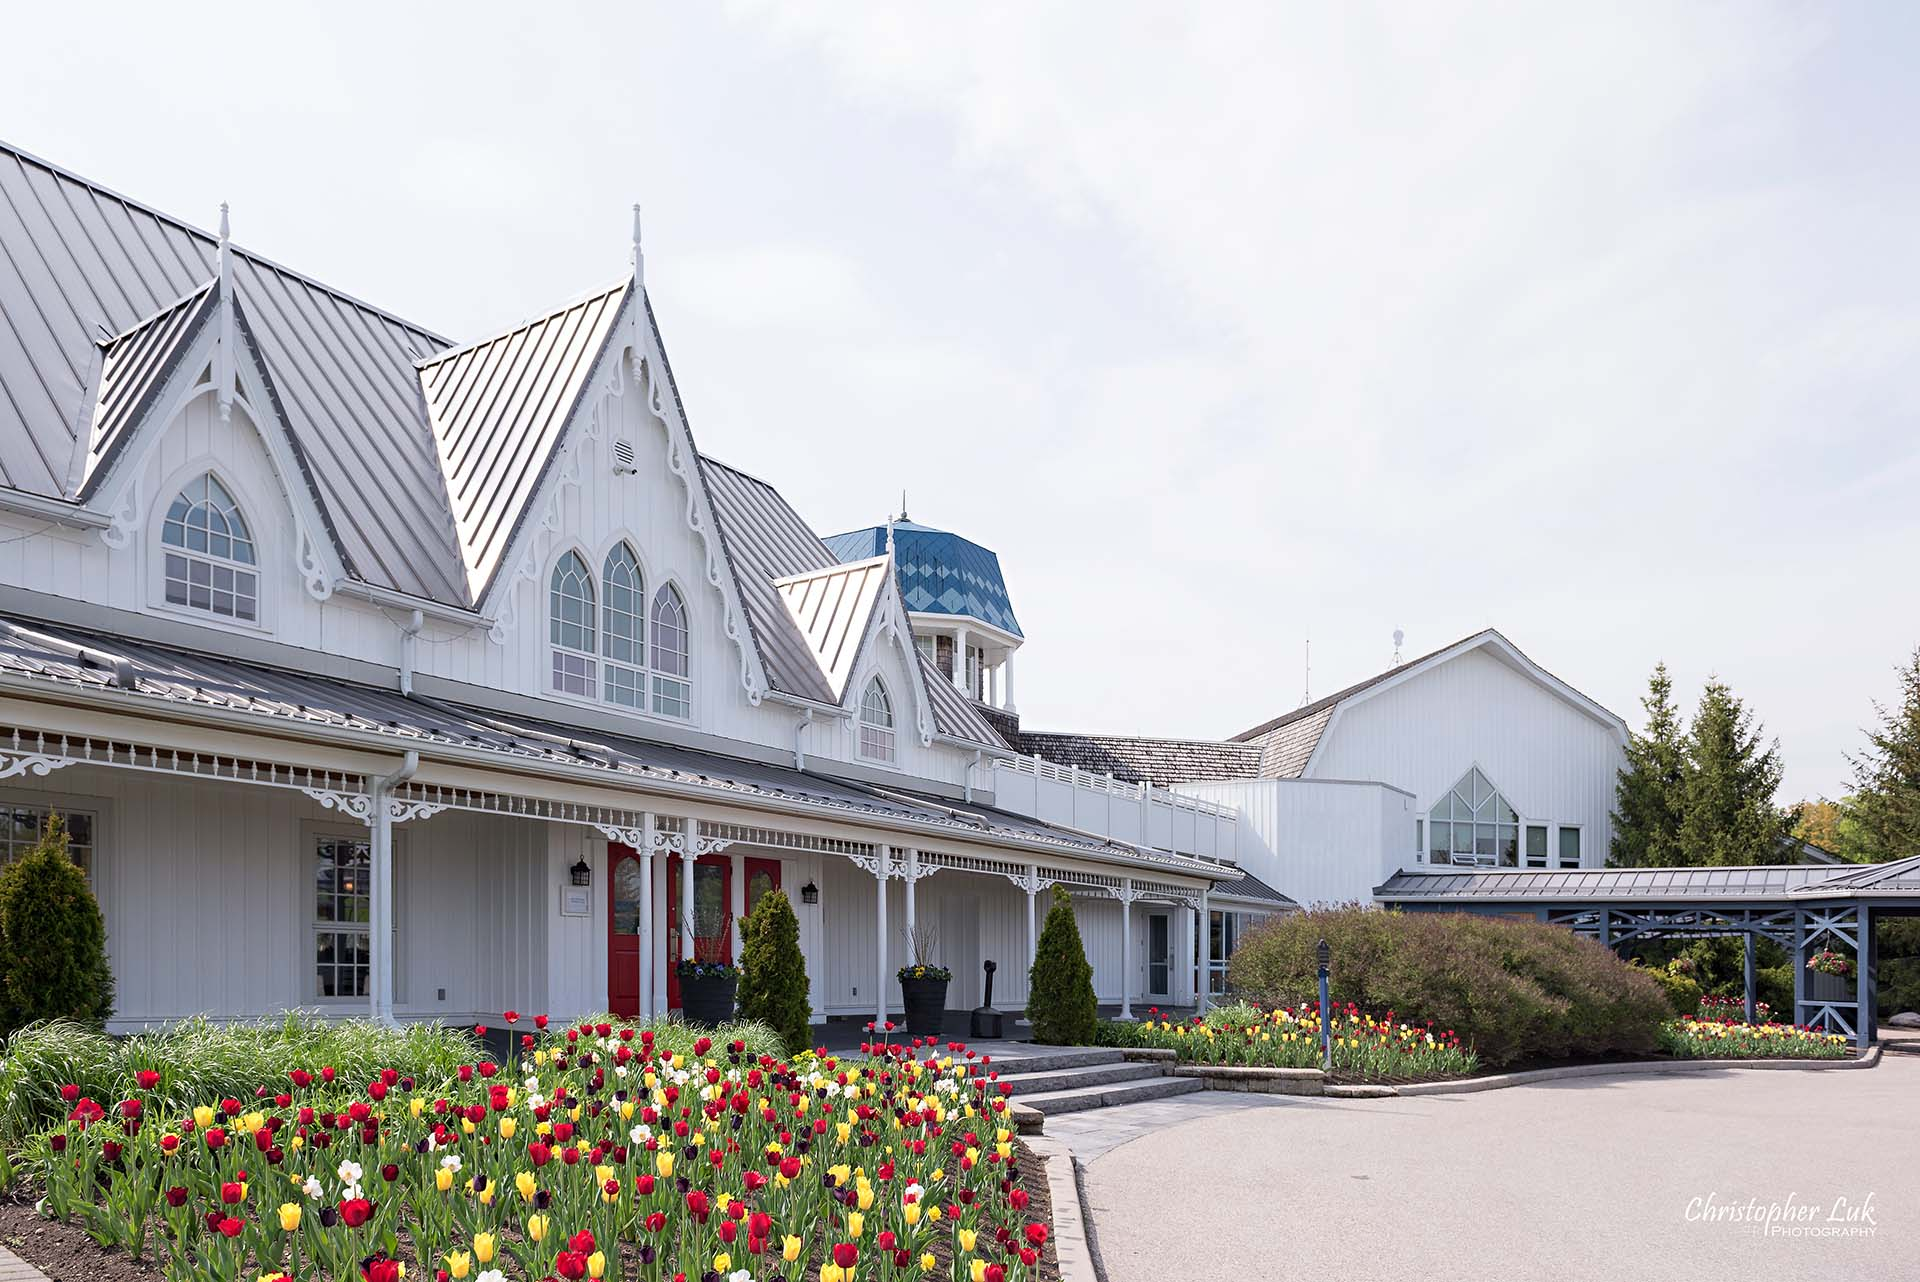 Christopher Luk Toronto Wedding Photographer Angus Glen Golf Club Markham Victoria Room Kennedy Loft Main Historic Estate Building Entrance Tulips Wide